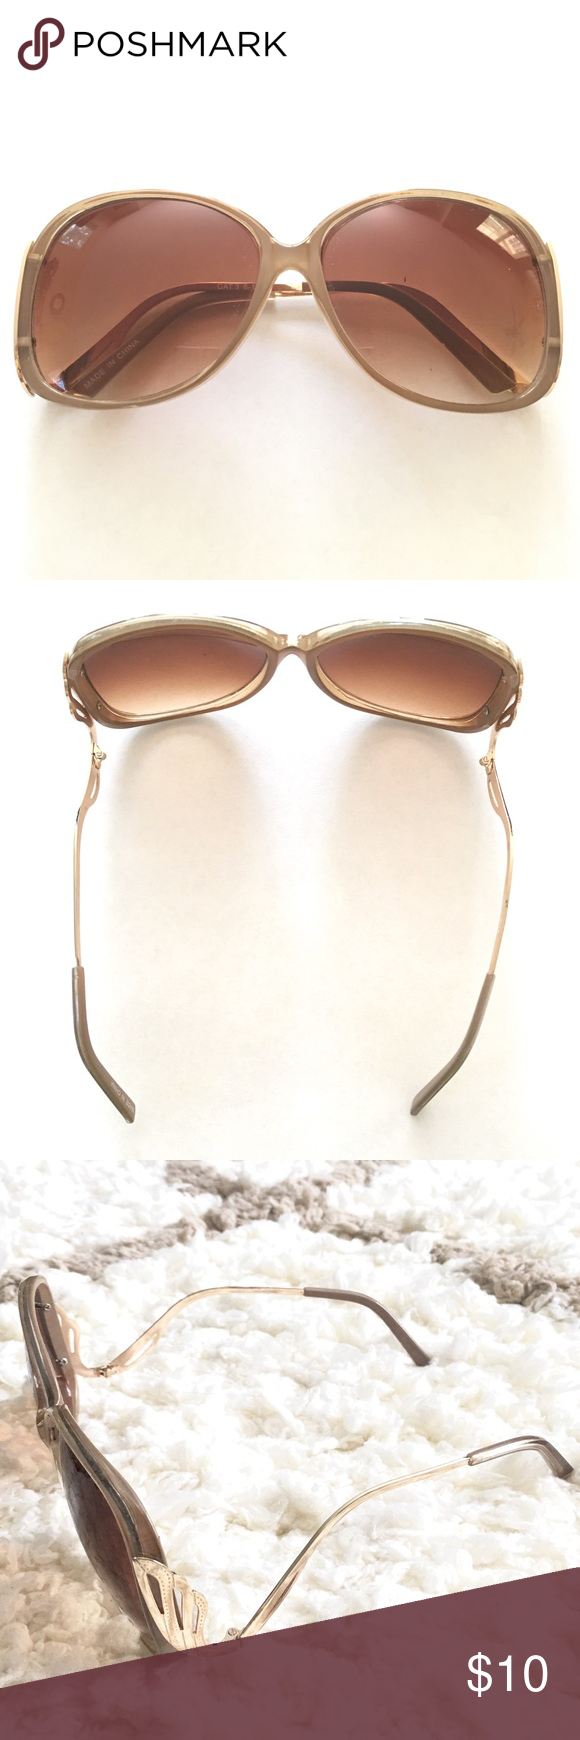 Brown Sunglasses Oversized Accessories Sunglasses